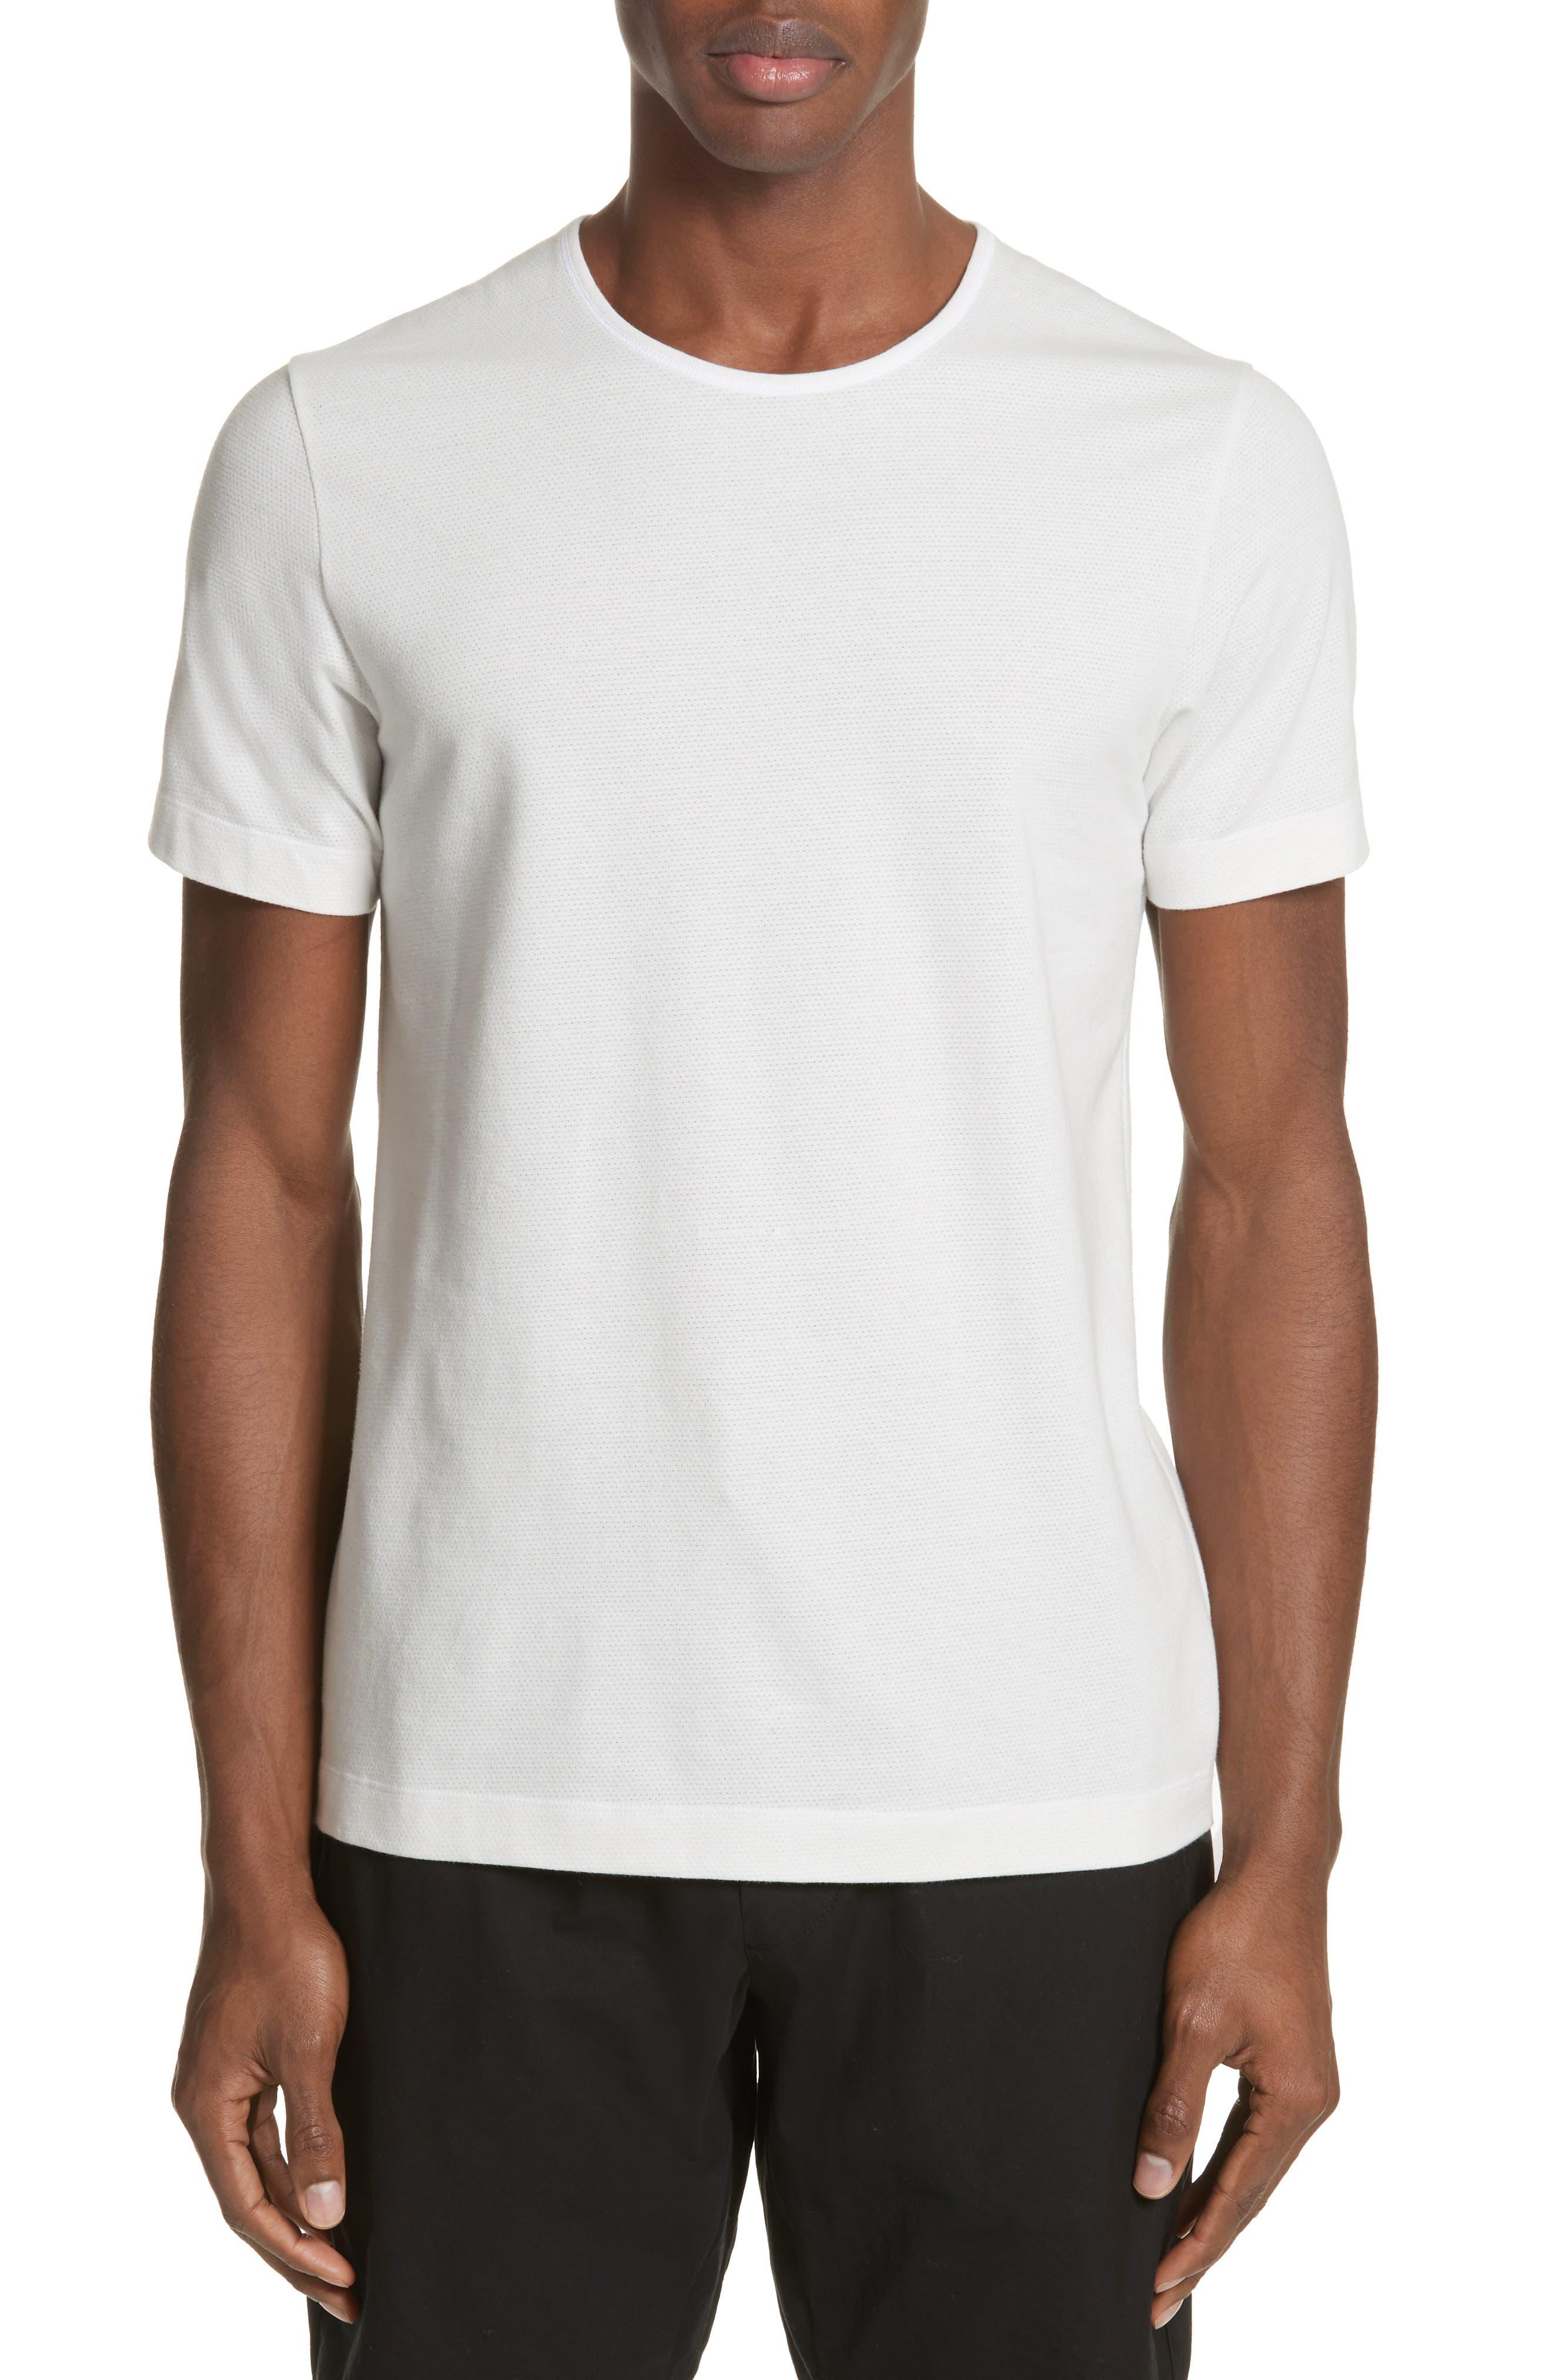 Alternate Image 1 Selected - wings + horns Mesh Jersey T-Shirt